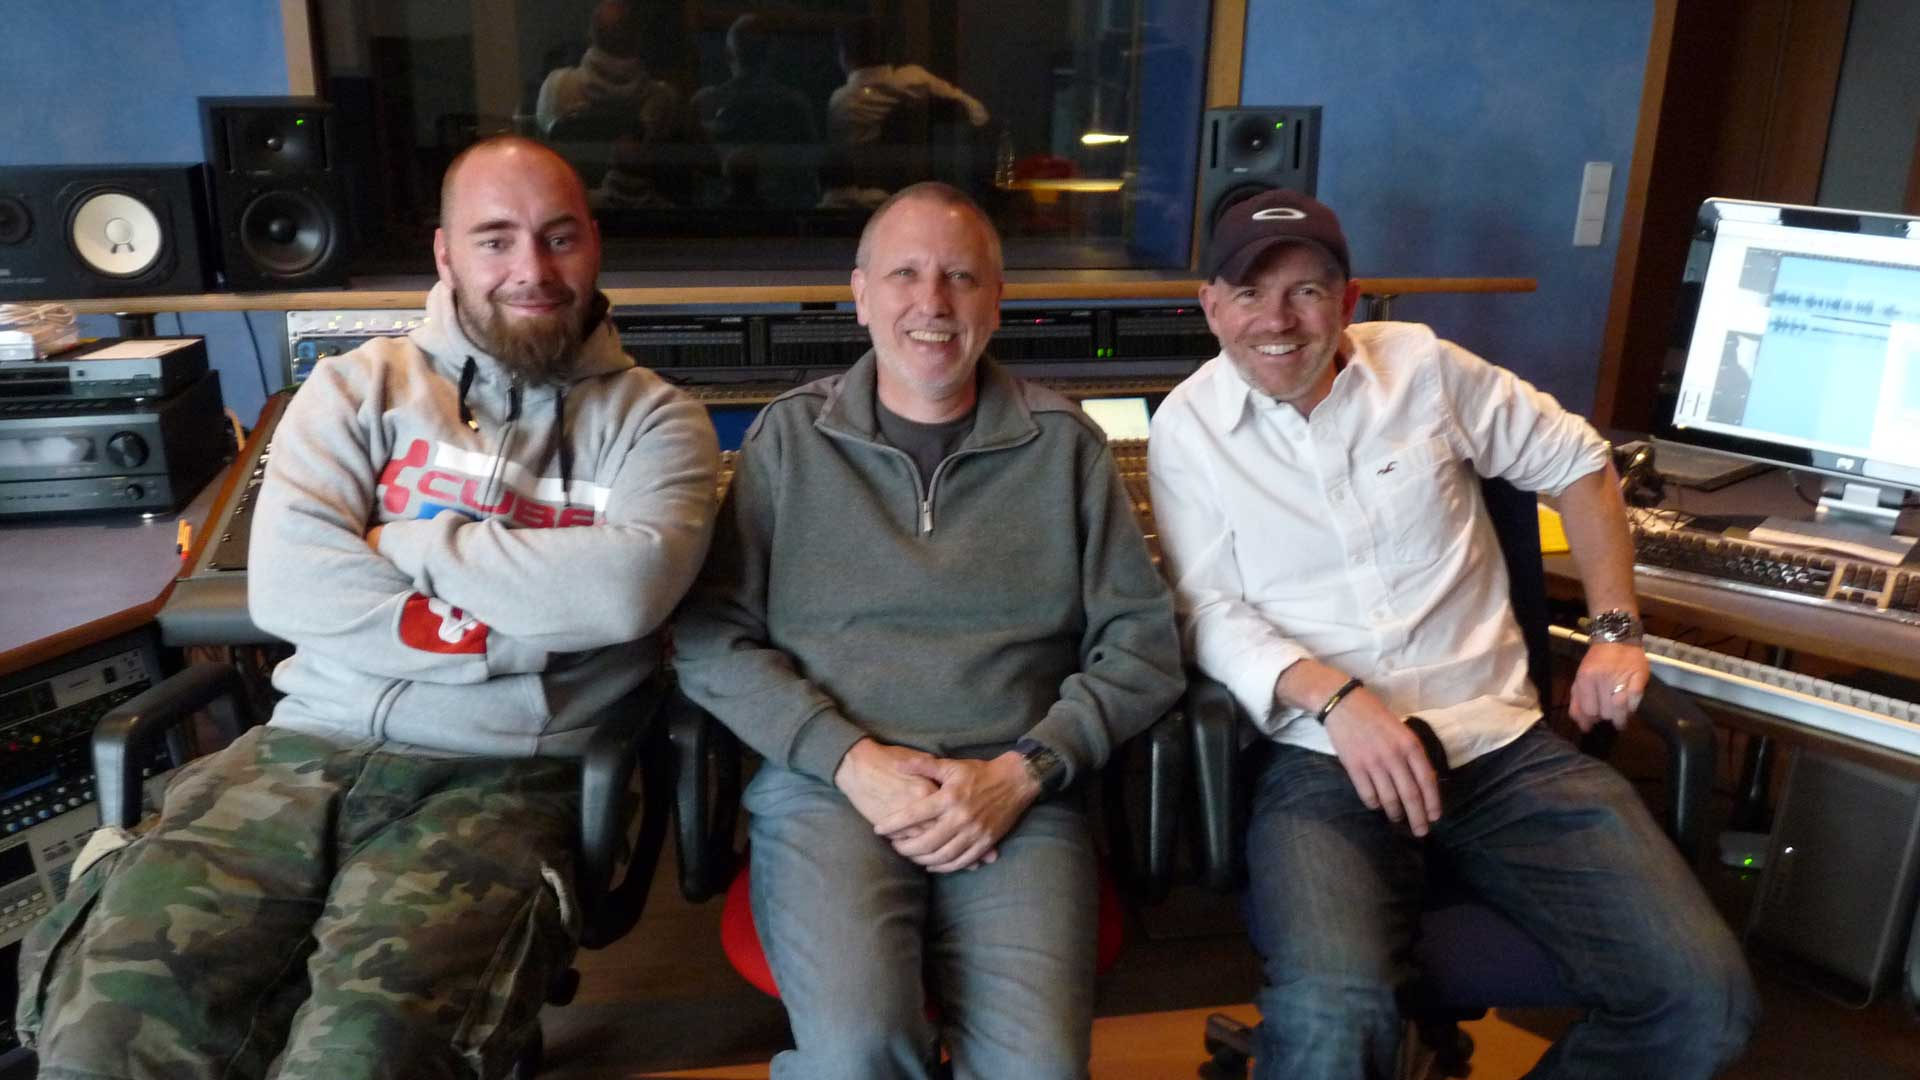 Gregor Spörri with Dietmar Wunder and Kai Lüftner at the Word recording studio in Berlin.